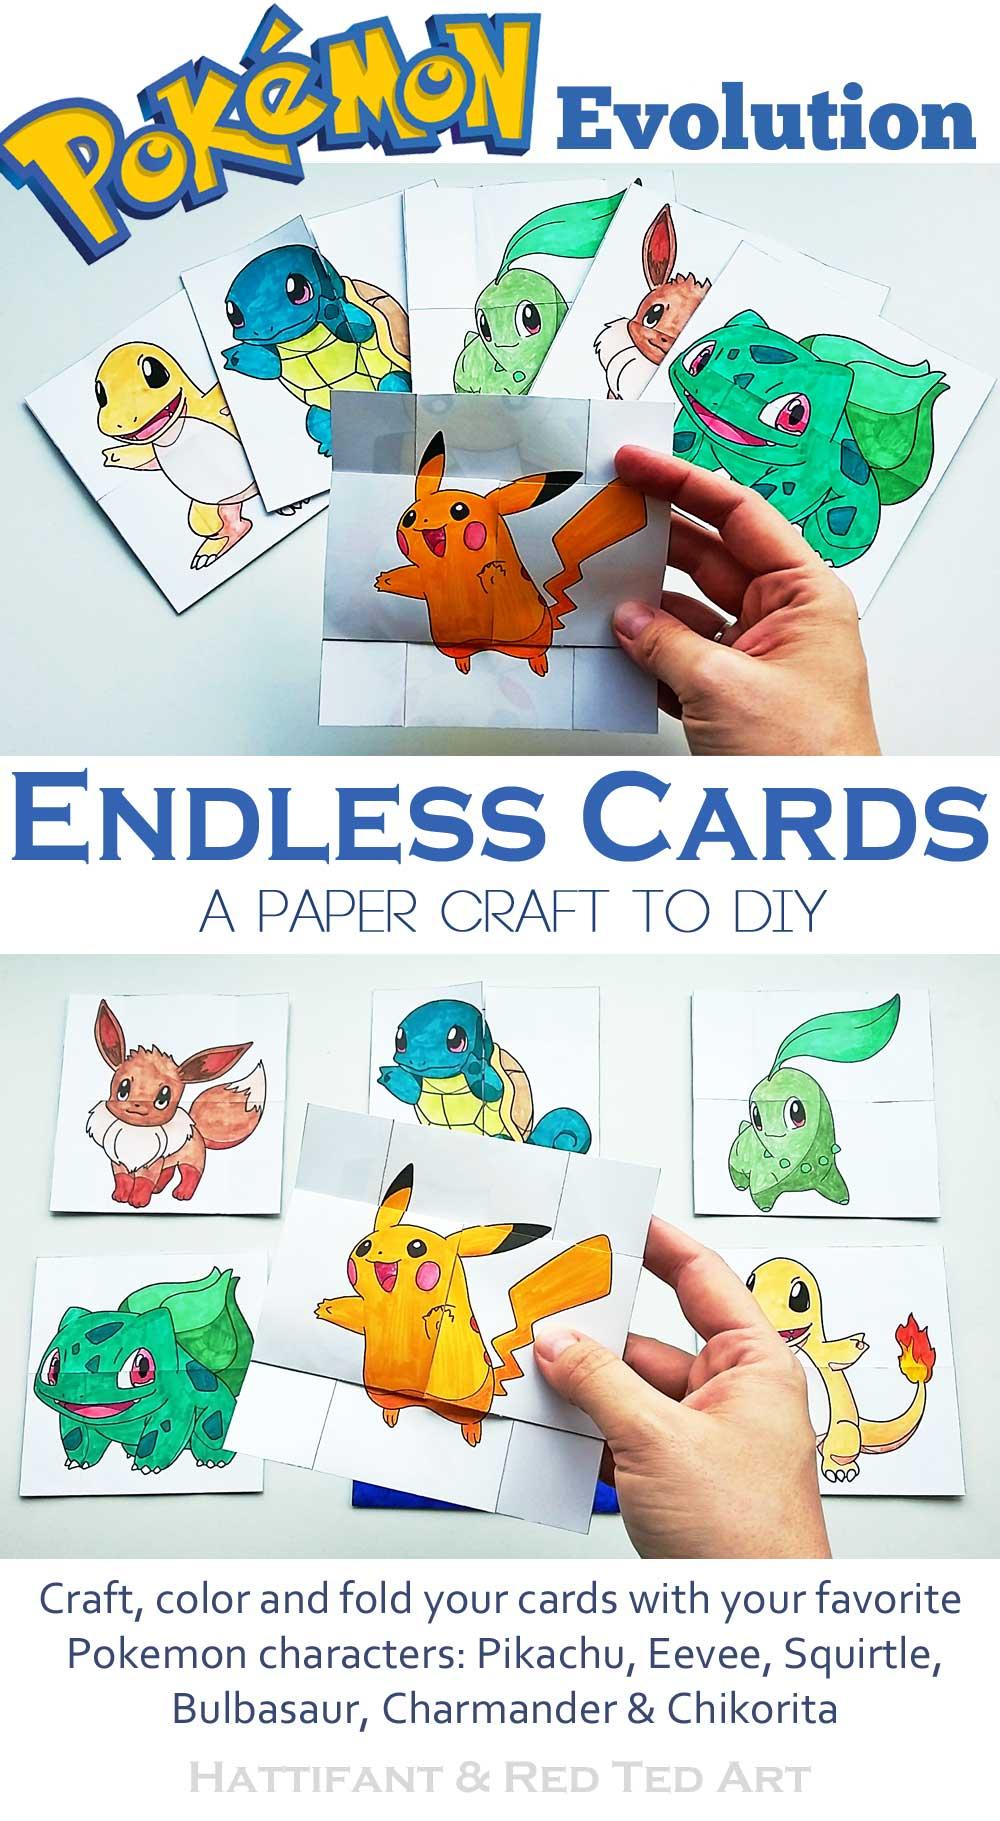 Hattifant Pokemon Evolution Endless Neverending Cards papercraft Printable